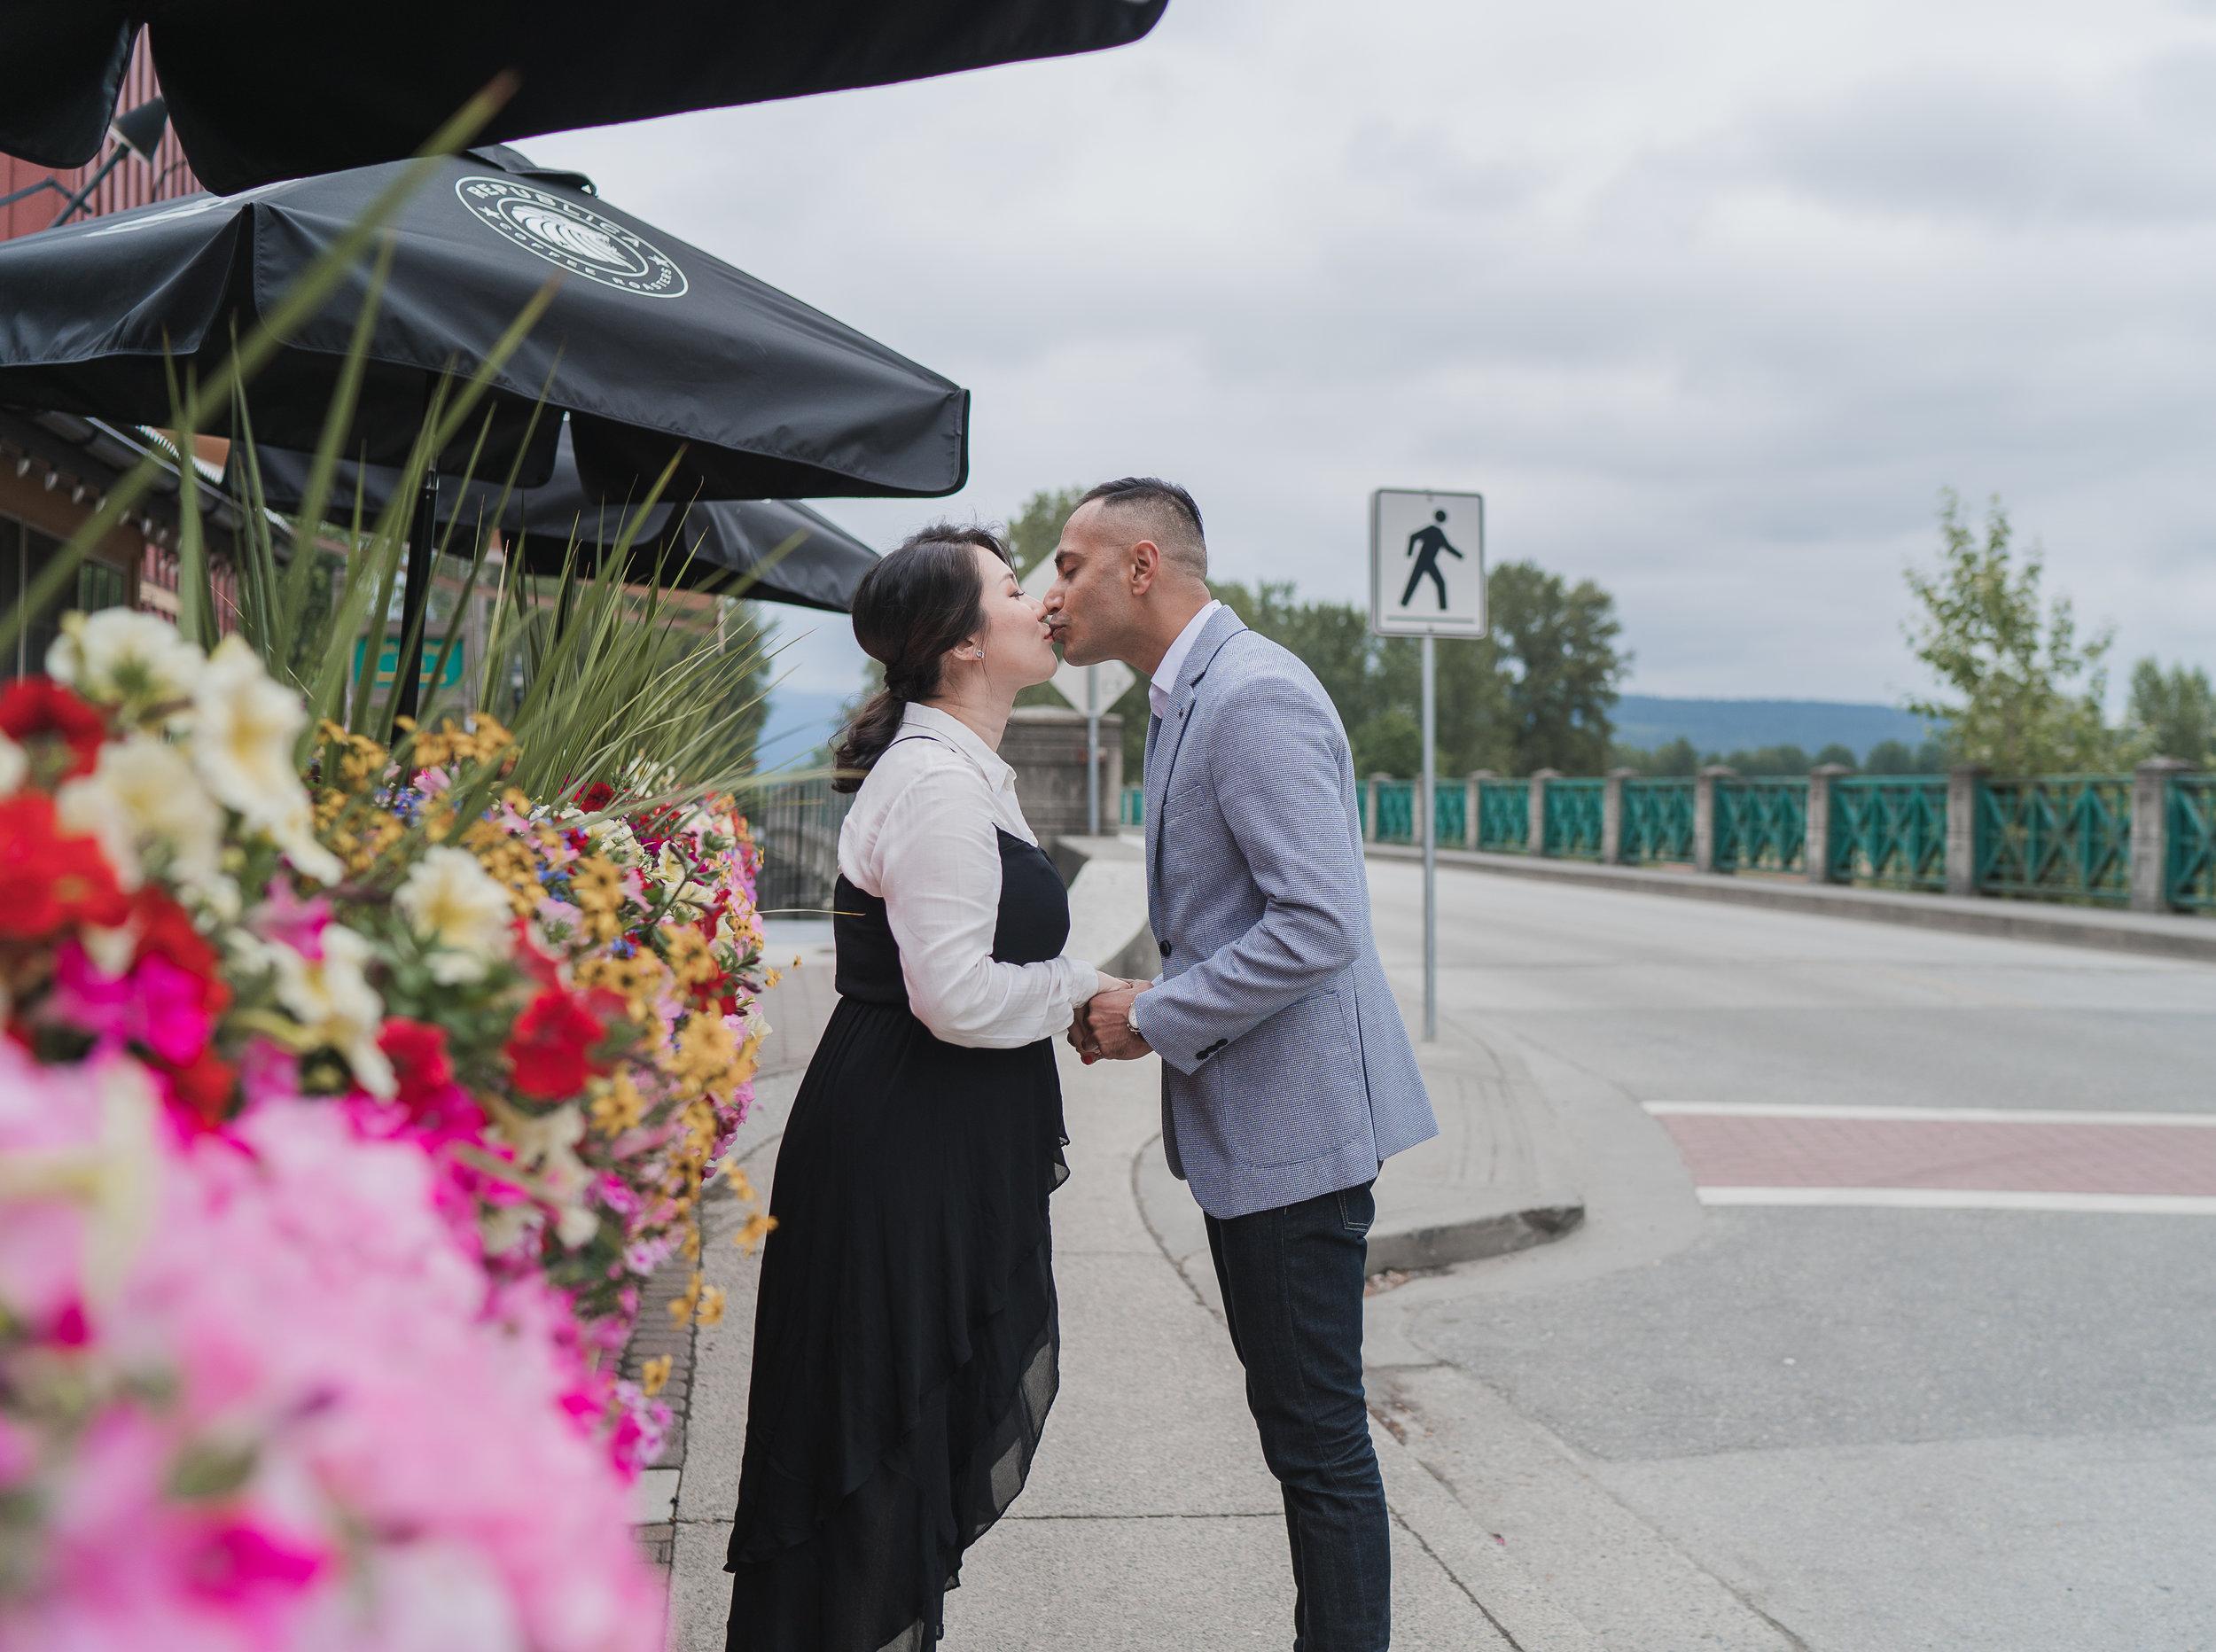 20190622 - Monika & Johnson Engagement- 0069.jpg